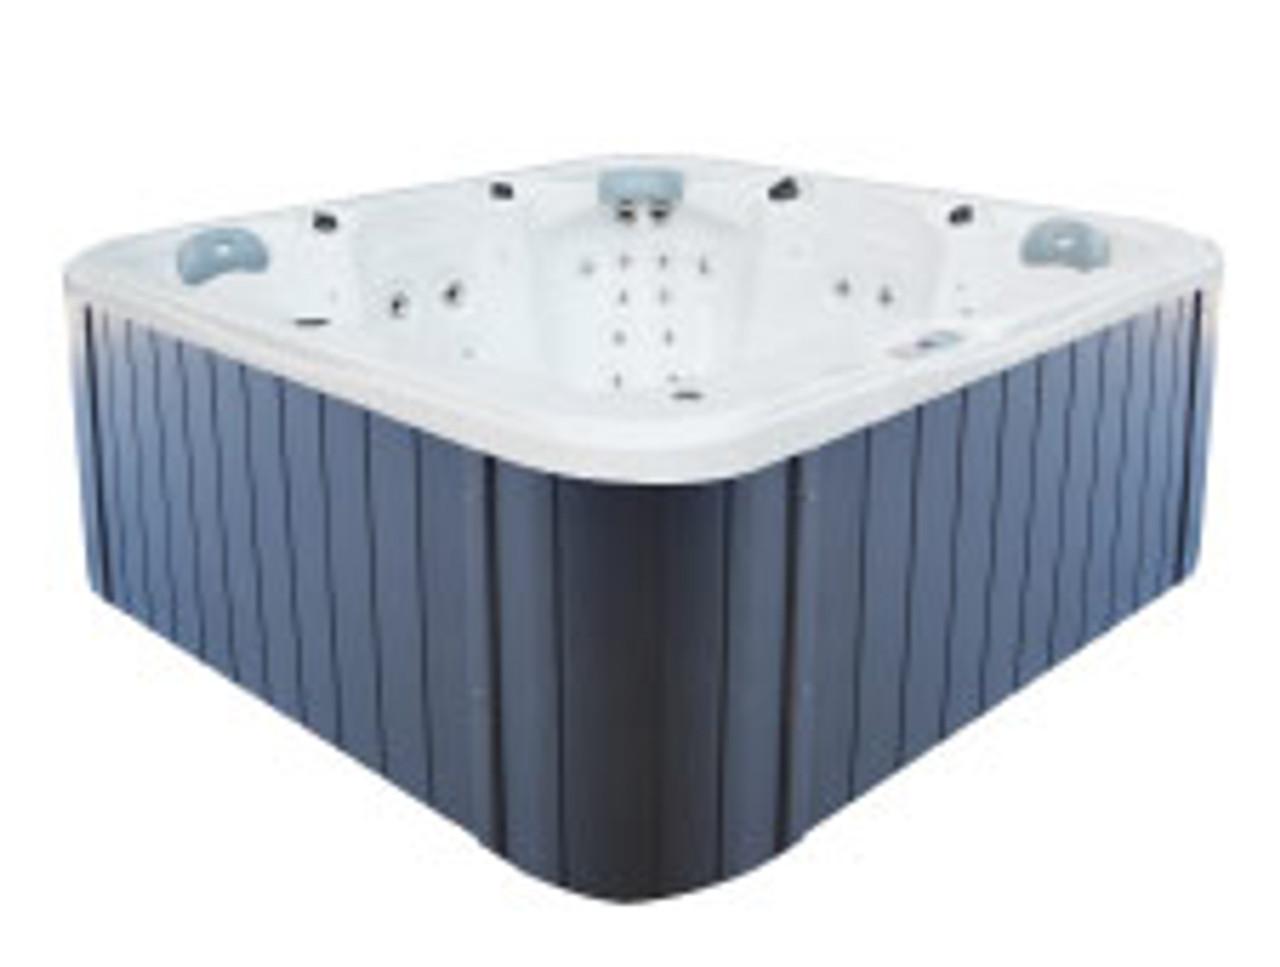 Galaxy Orion Spa Pool